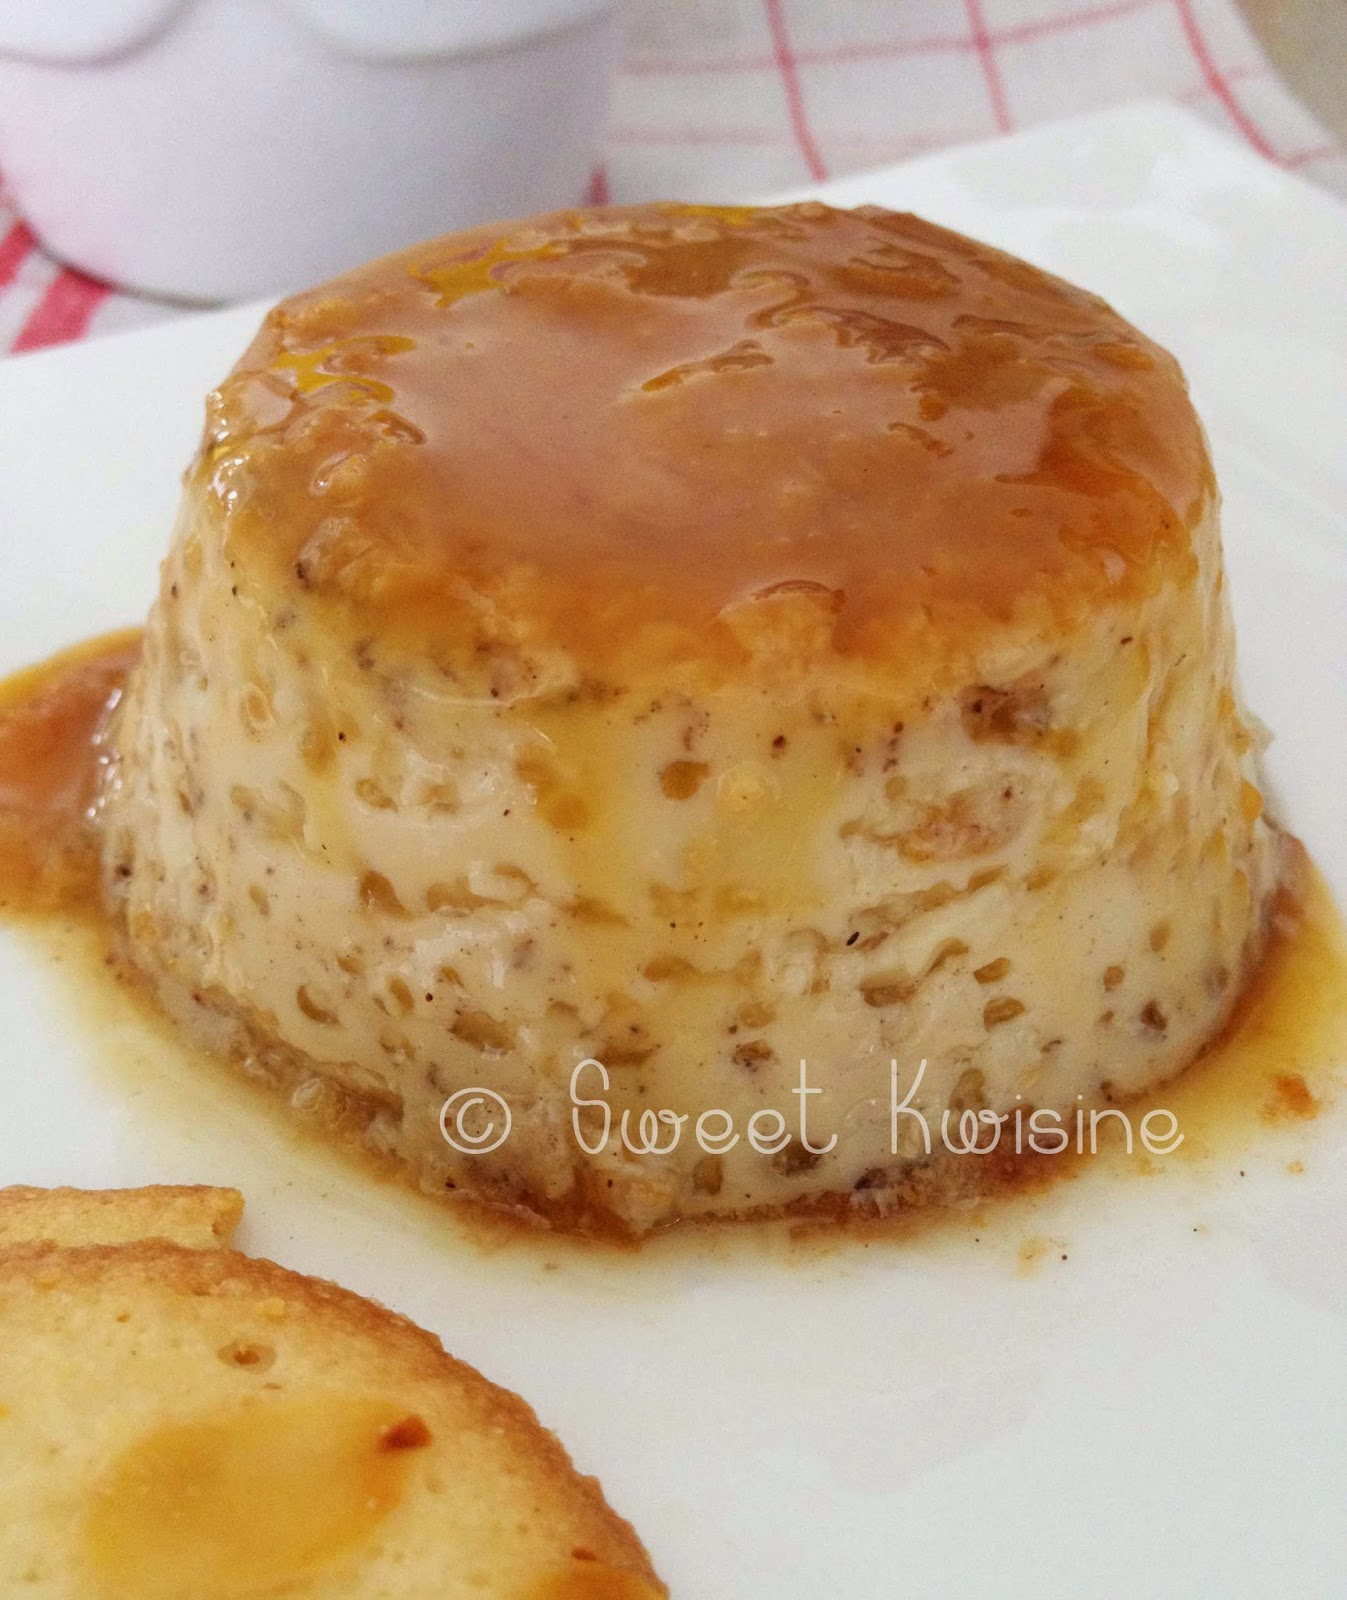 sweet kwisine, crème aux oeufs, vanille, caramel, caramel beurre salé, dessert, cuisine facile, dessert d'enfance